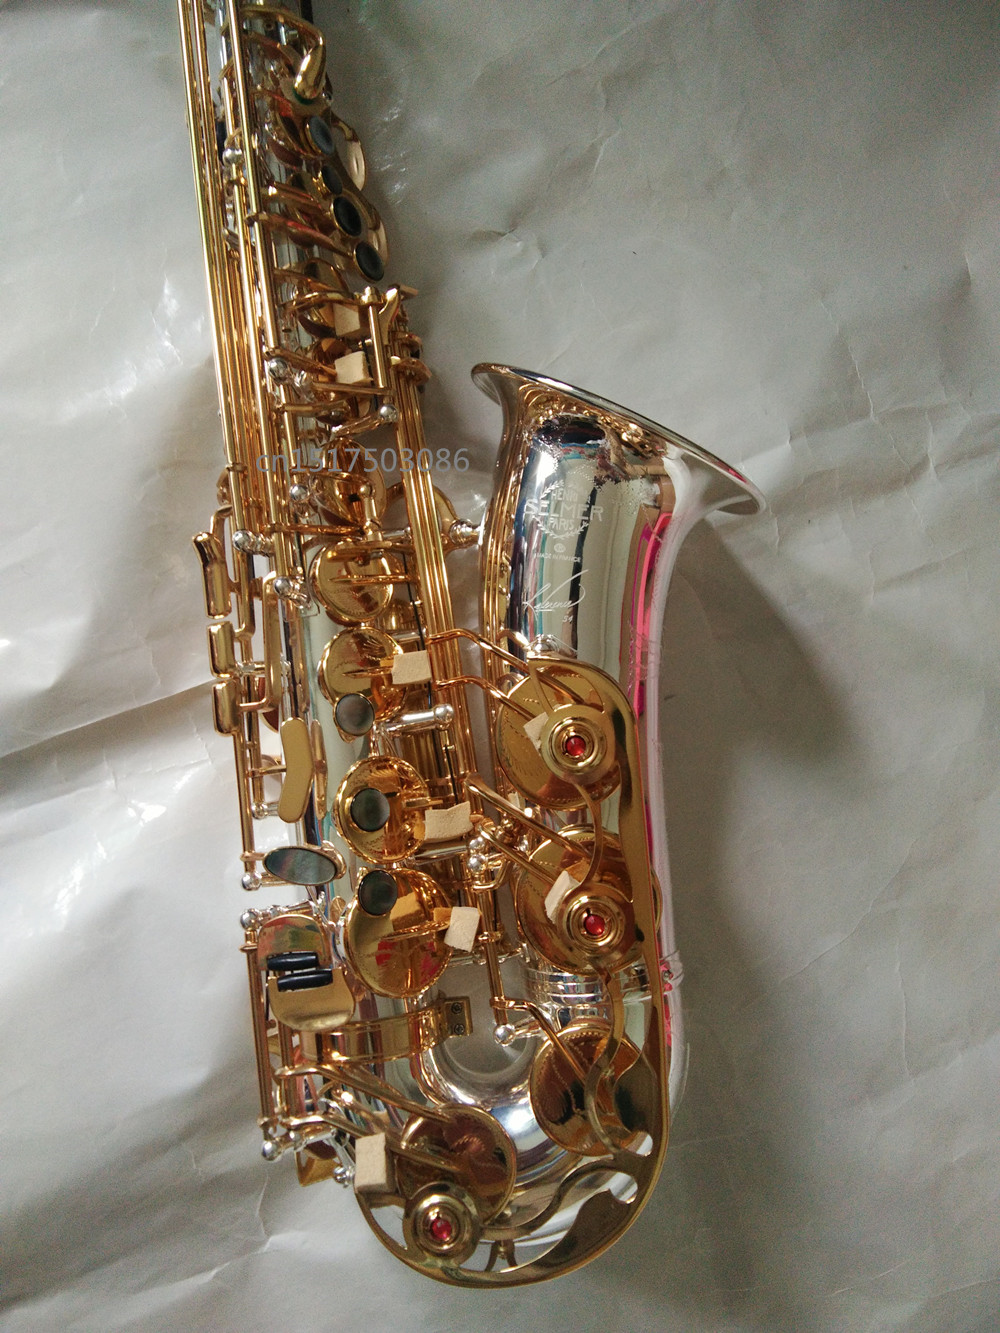 Saxophone instrument Selmer Saxophone Eb Silver Alto Sax Gold key Saxophone Professional Saxophone Mouthpiece Depth engraved alto saxophone selmer 54 brass silver gold key e flat musical instruments saxophone with cleaning brush cloth gloves cork strap